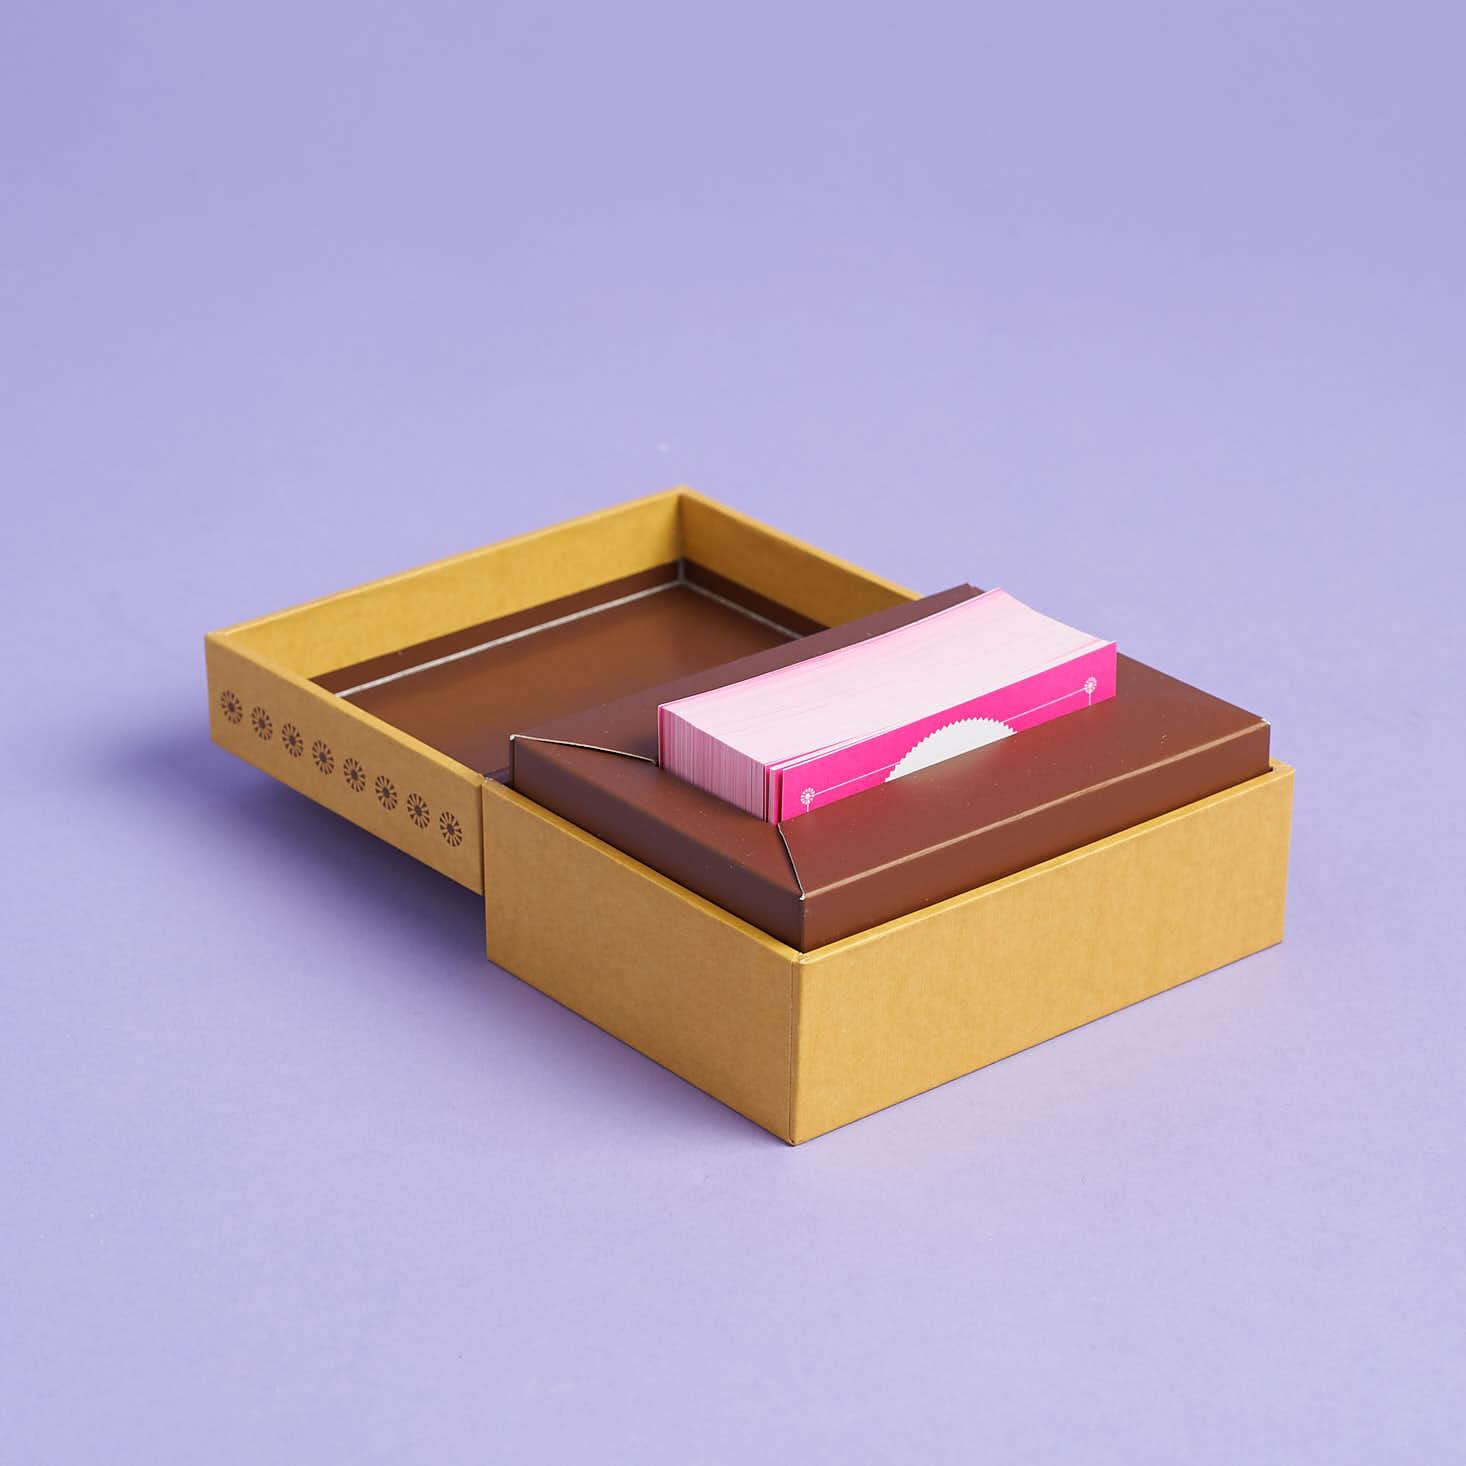 Modern-Love-Box-March-2018-0016-733x733@2x